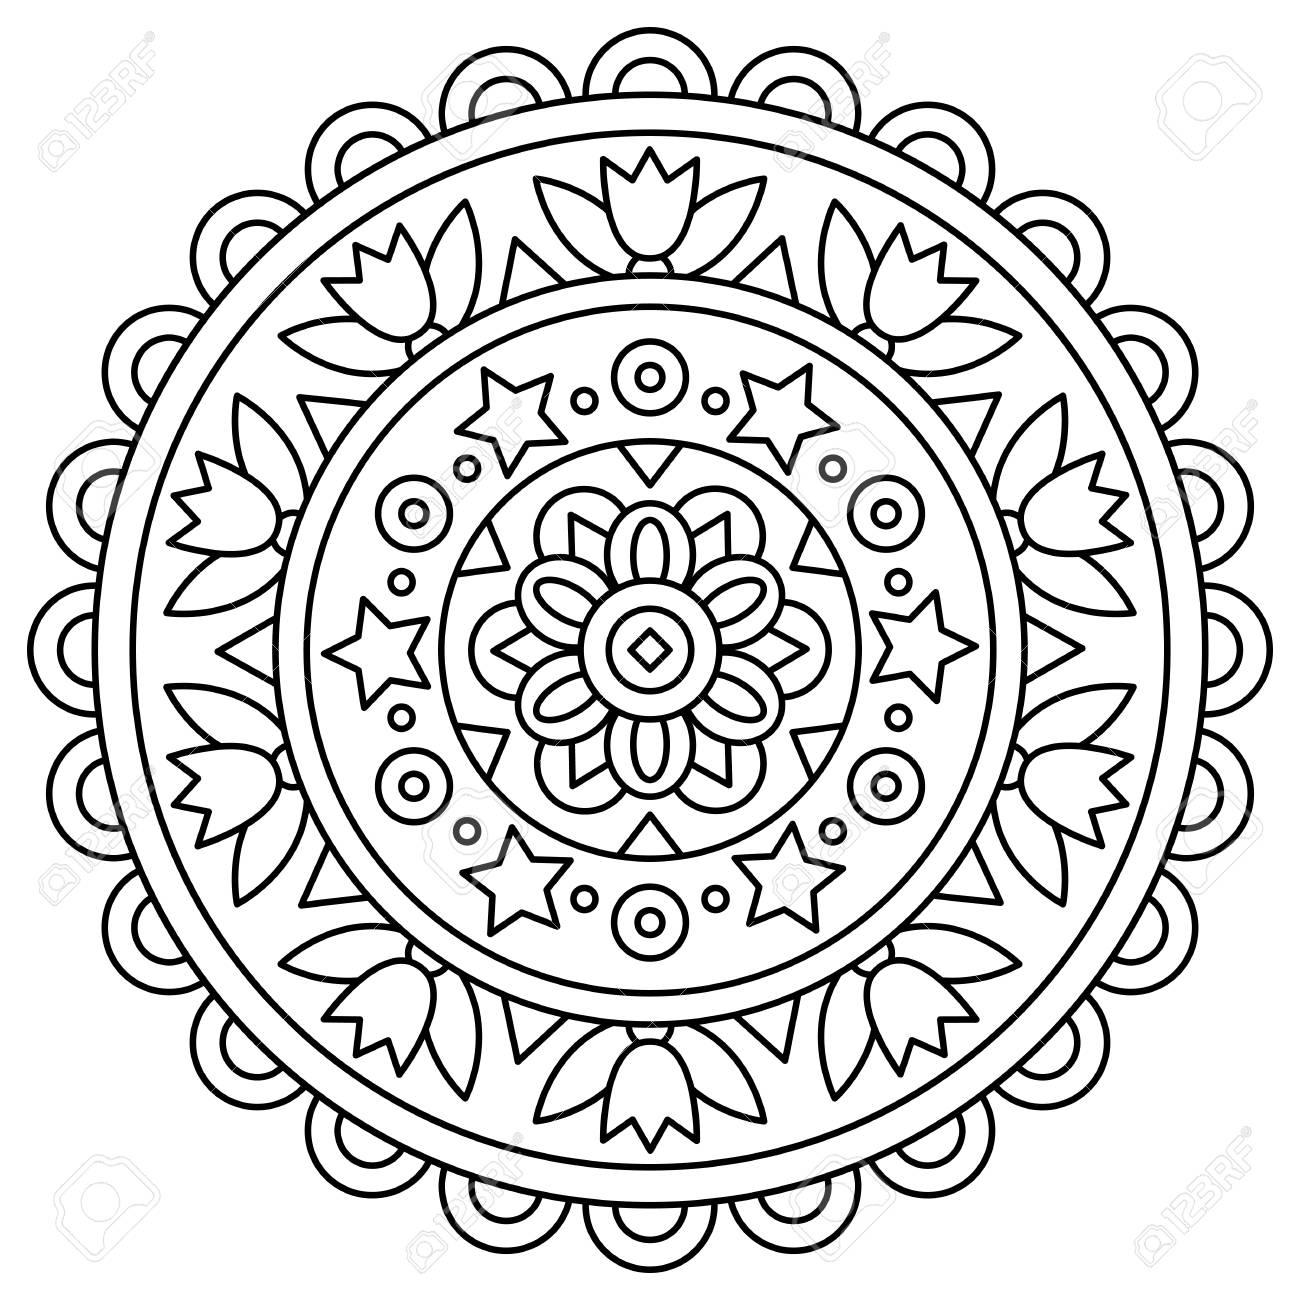 Mandala Dibujo Para Colorear Ilustracion Del Vector